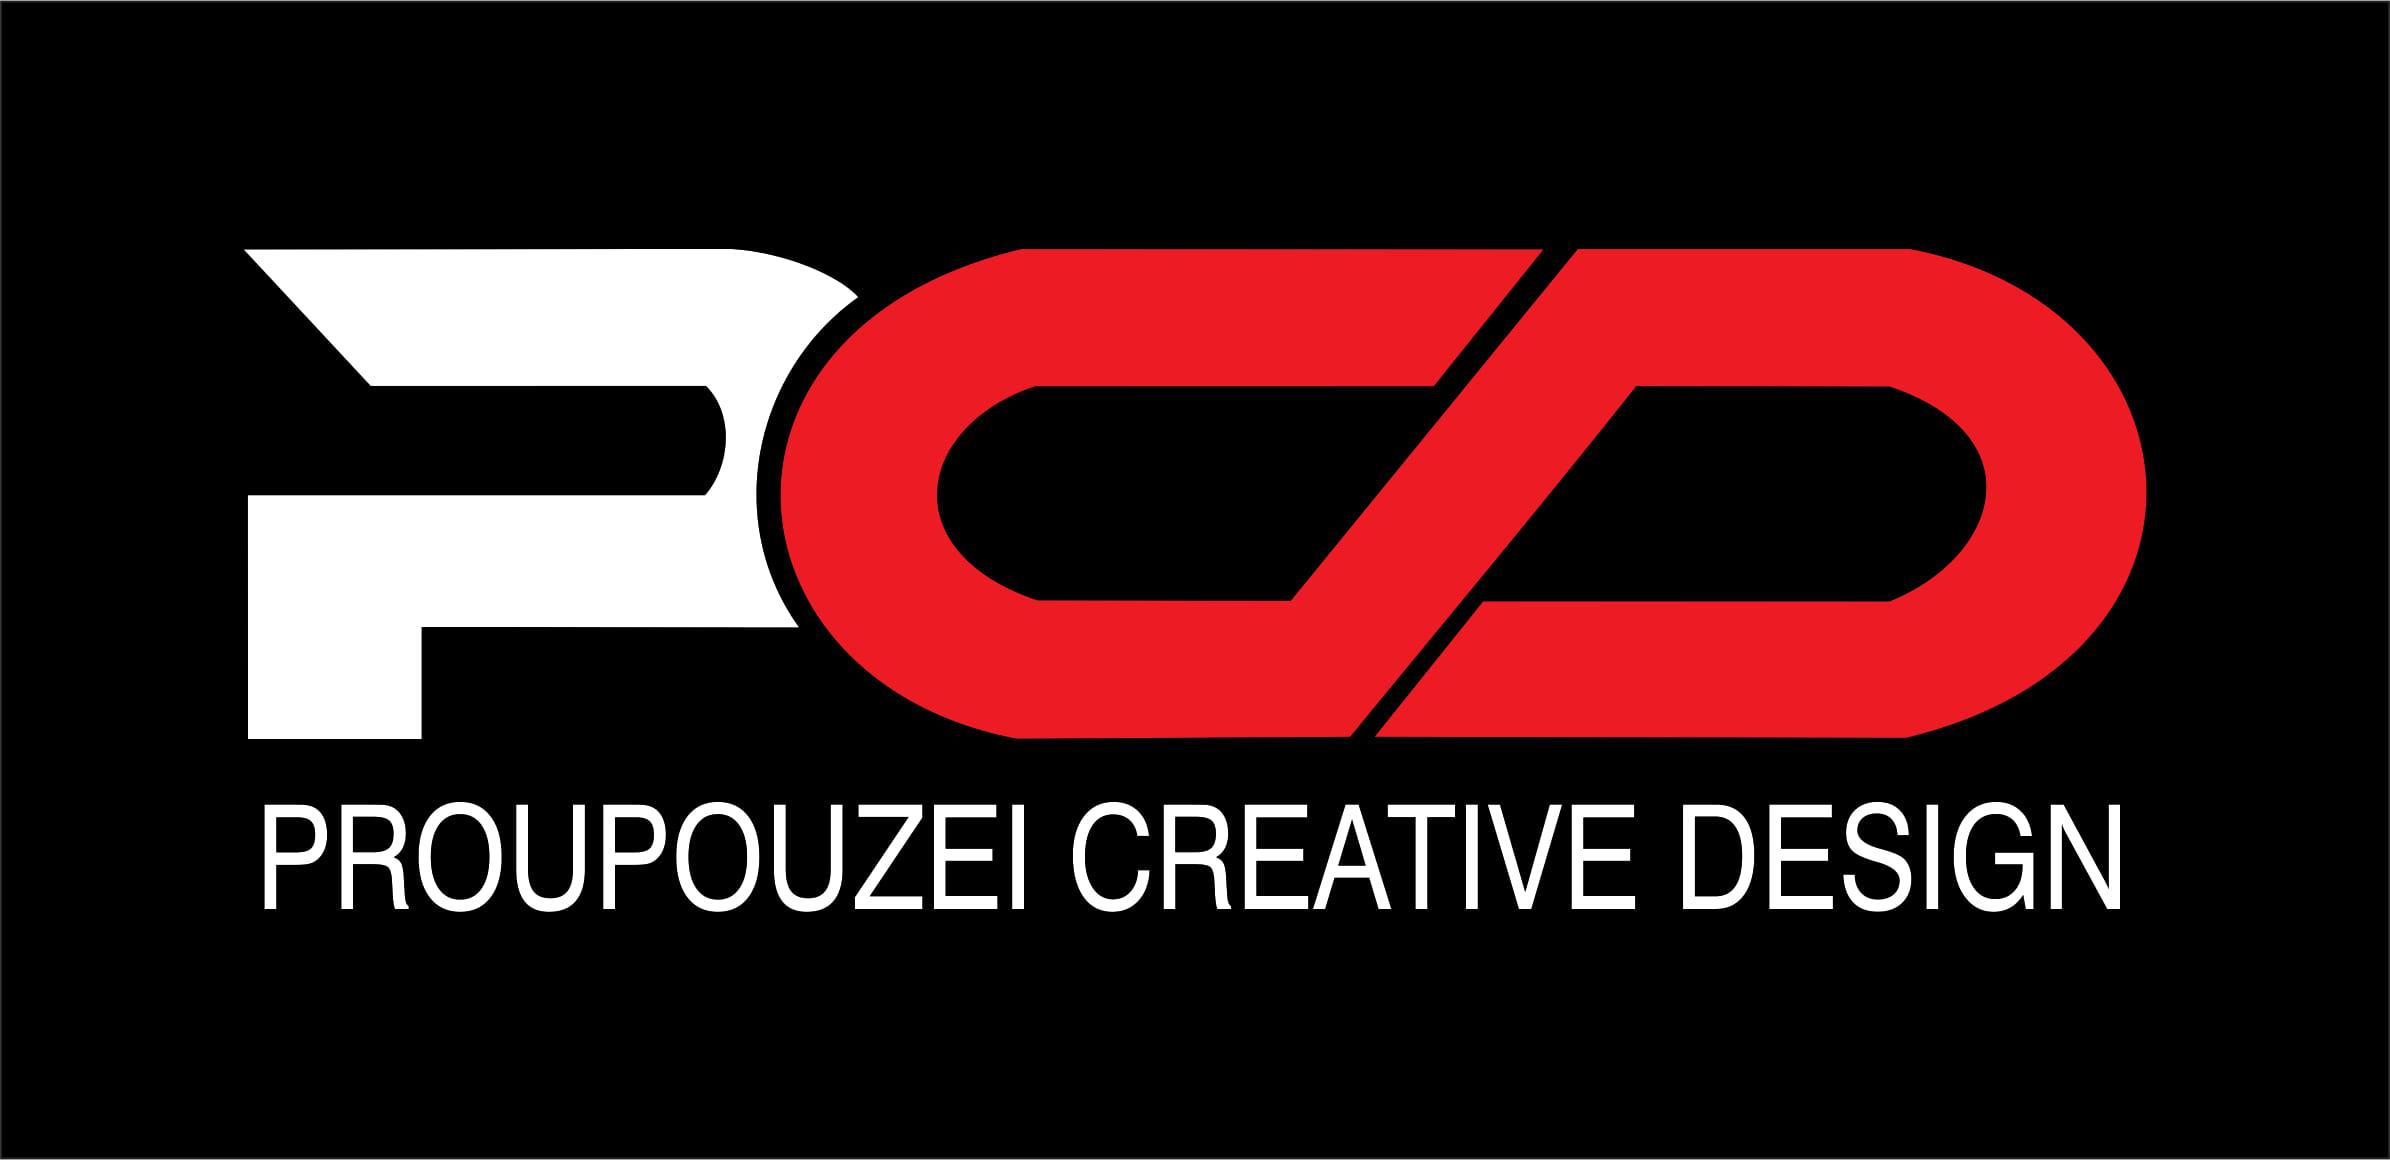 Proupouzeri Creative Design